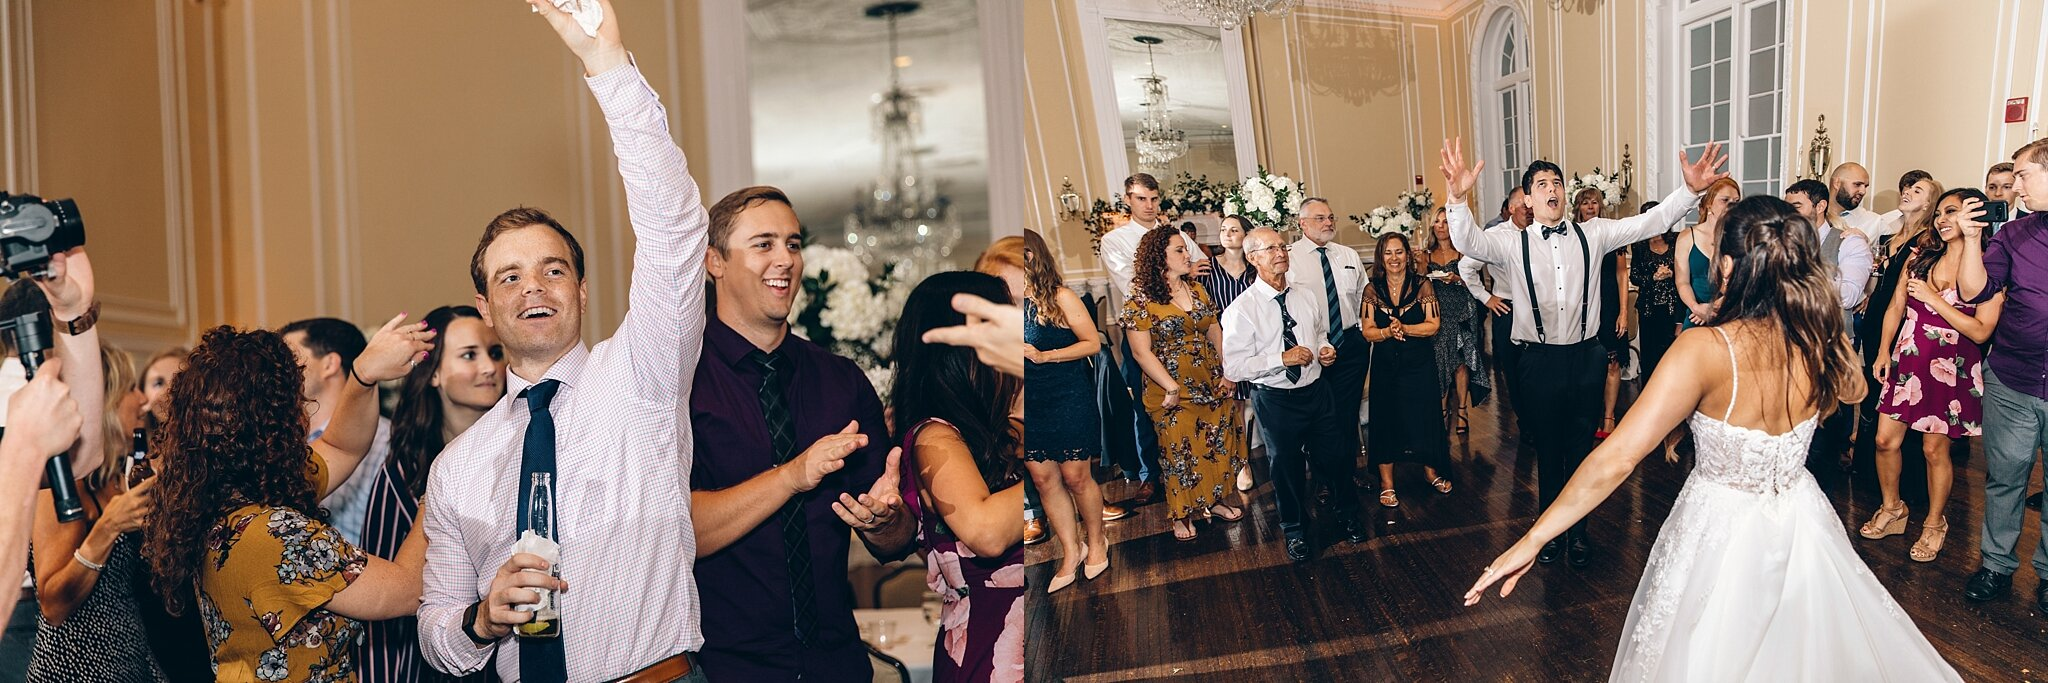 patrick-henry-ballroom-wedding-roanoke_0559.jpg